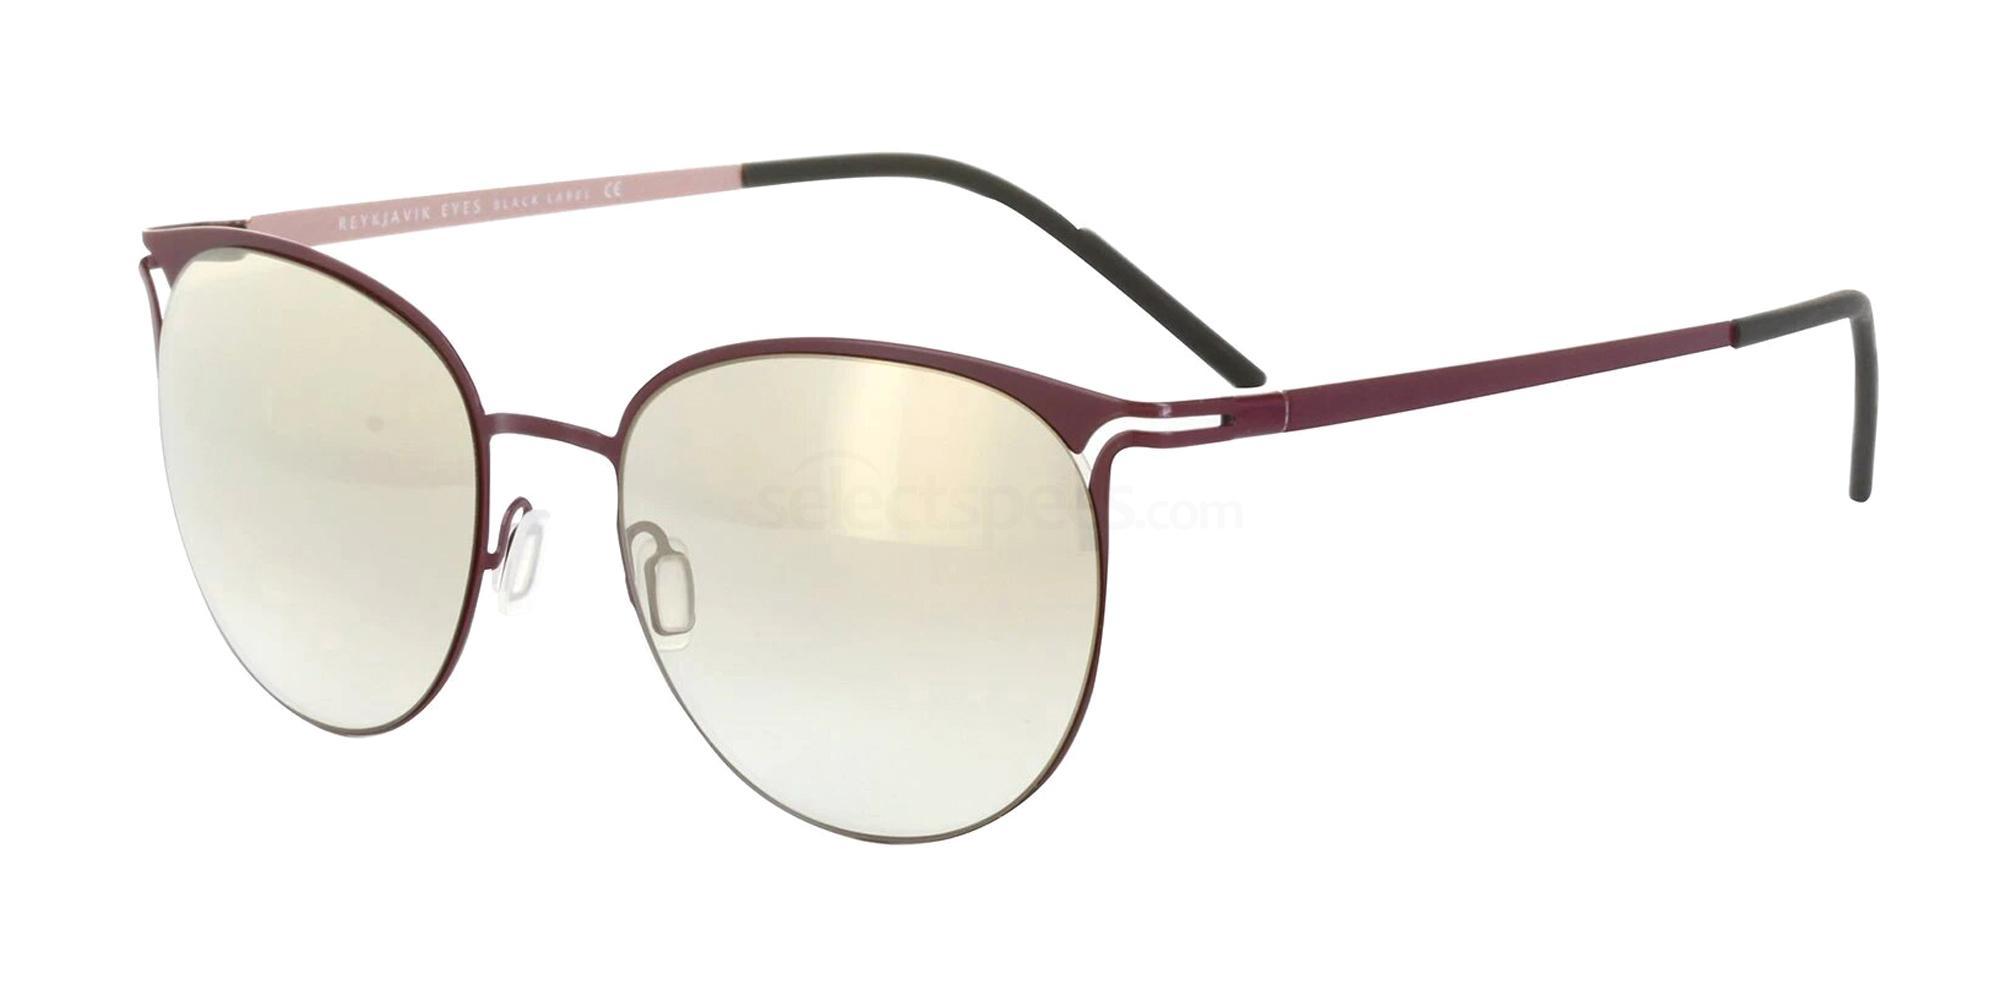 С1 MR OWL Sunglasses, Reykjavik Eyes Black Label